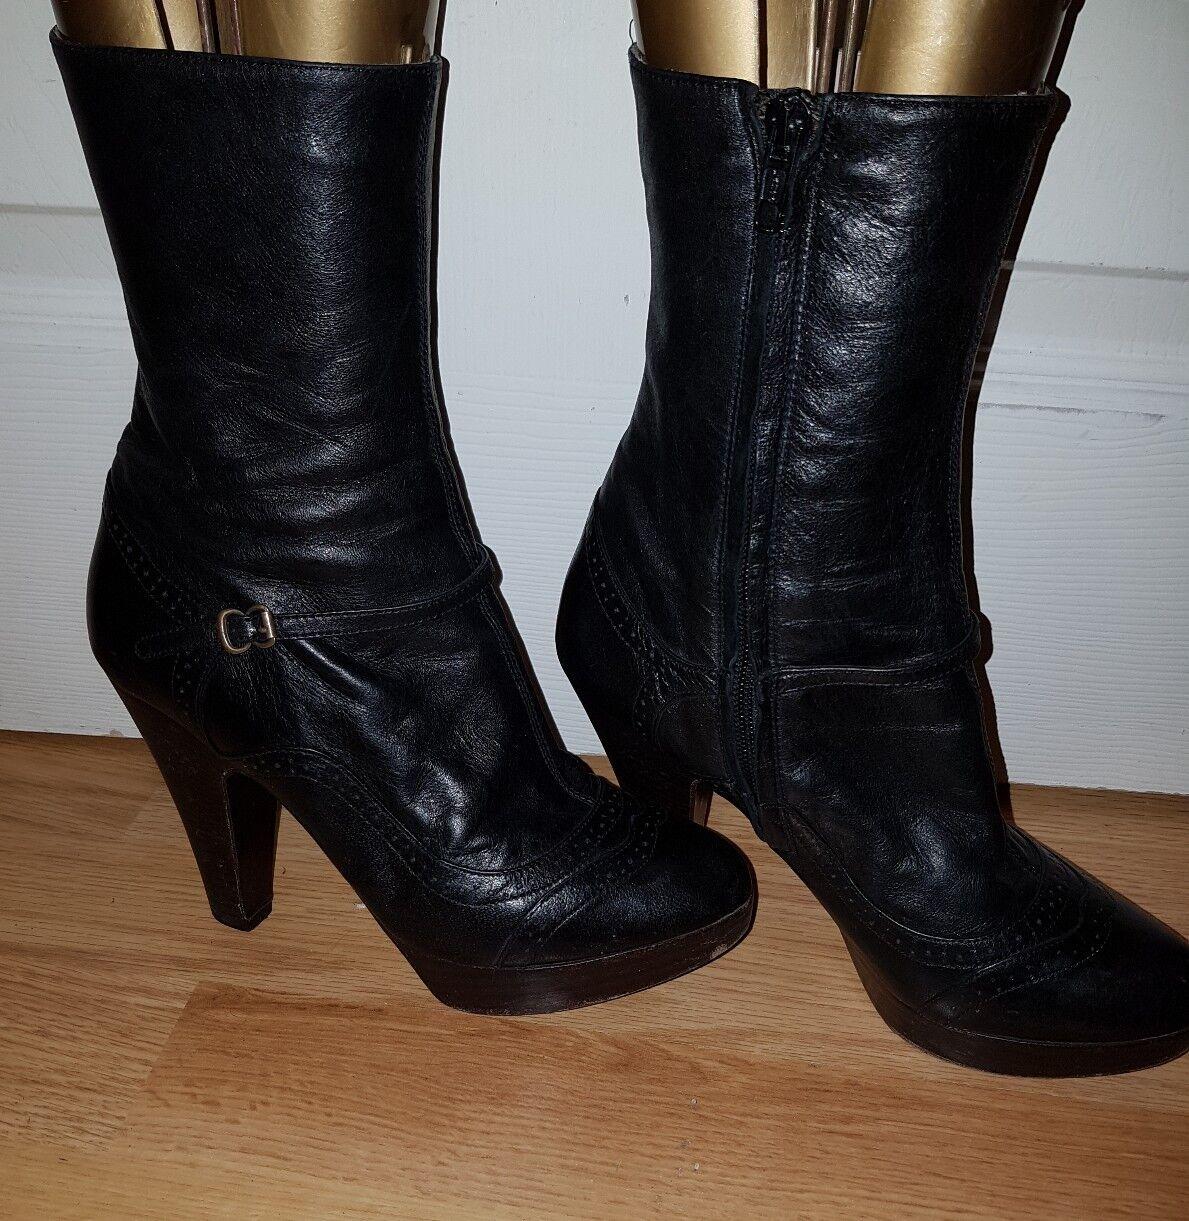 L'AUTRE CHOSE Damenschuhe ANKLE Stiefel Stiefel Stiefel a04a14